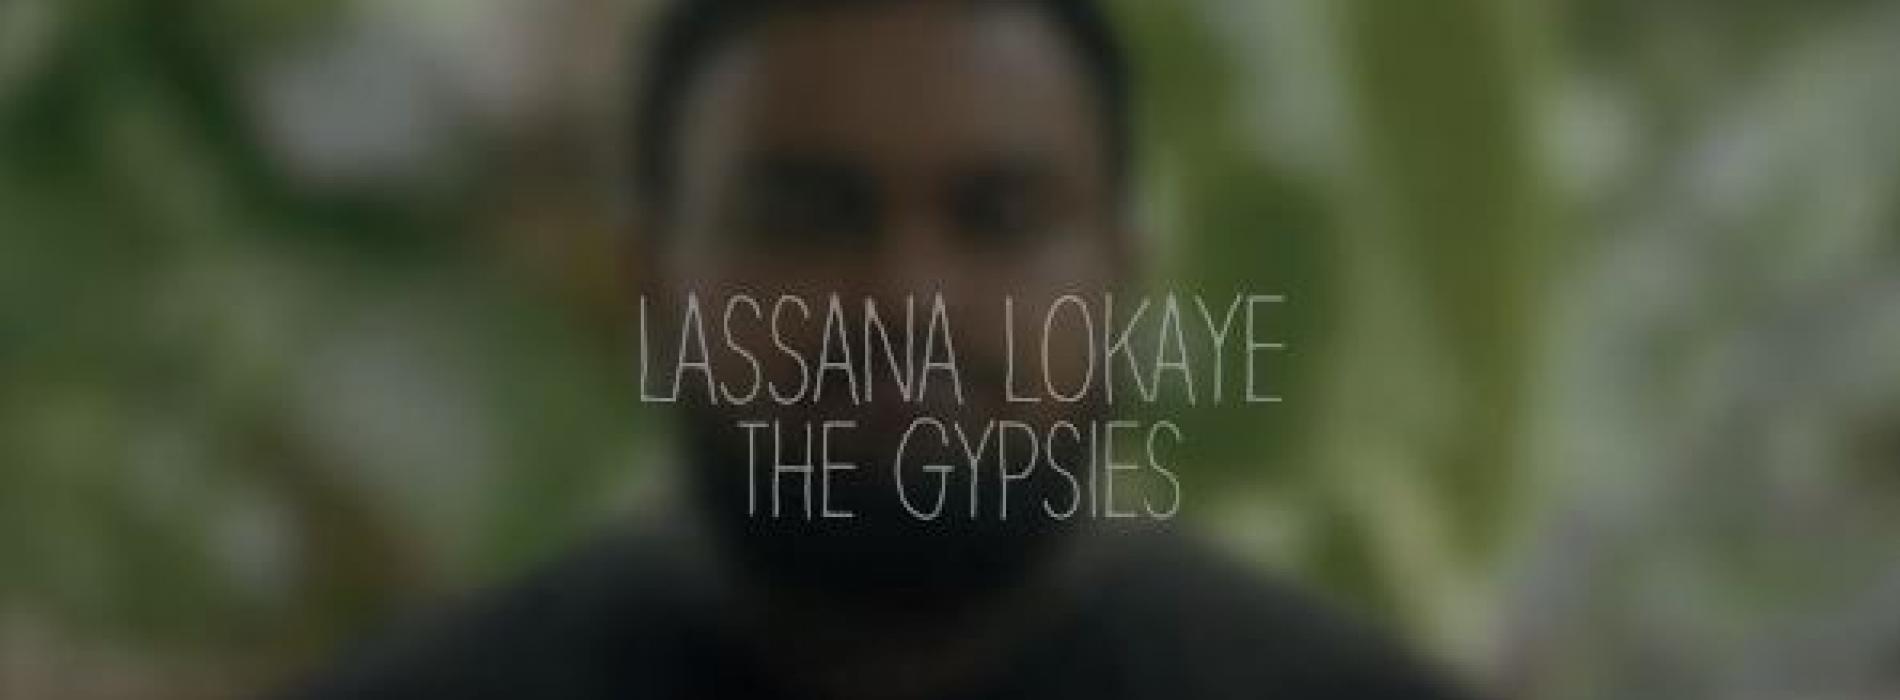 New Music : Gypsies – Lassana Lokaye (Cover by Minesh ft Shalintha Rodrigo)